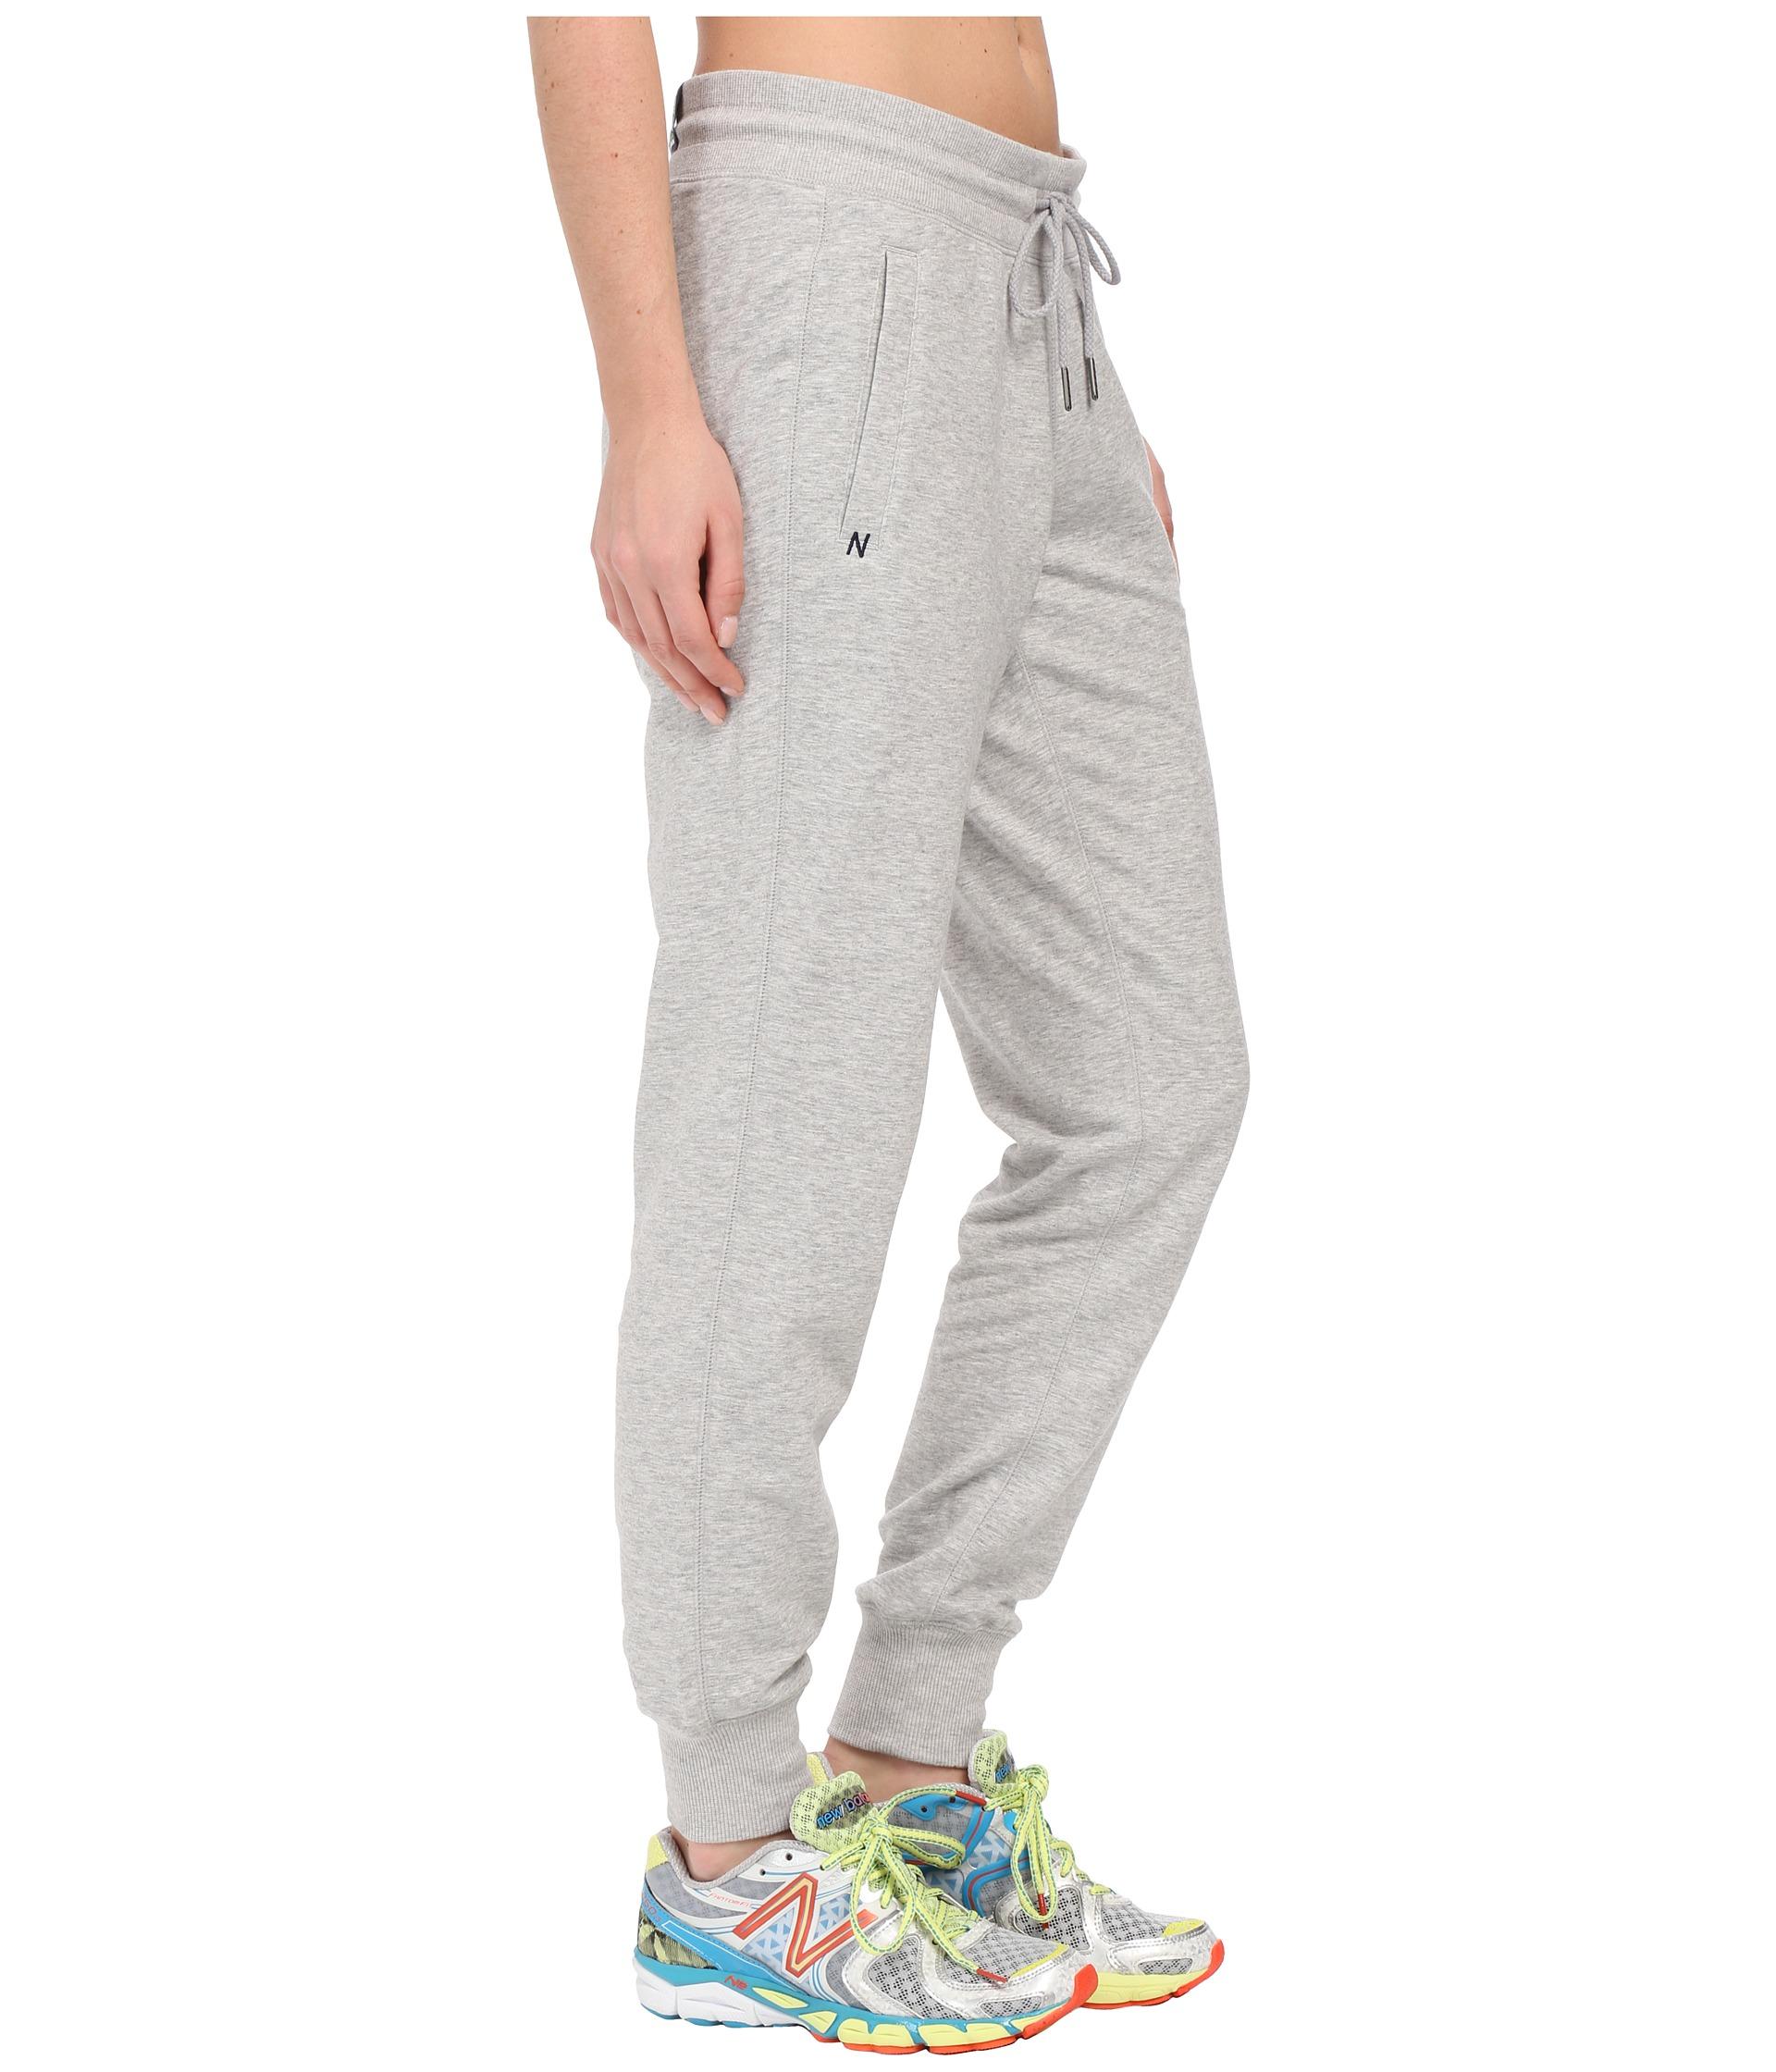 fefae89348768 New Balance Essentials Classic Sweatpant in Gray - Lyst